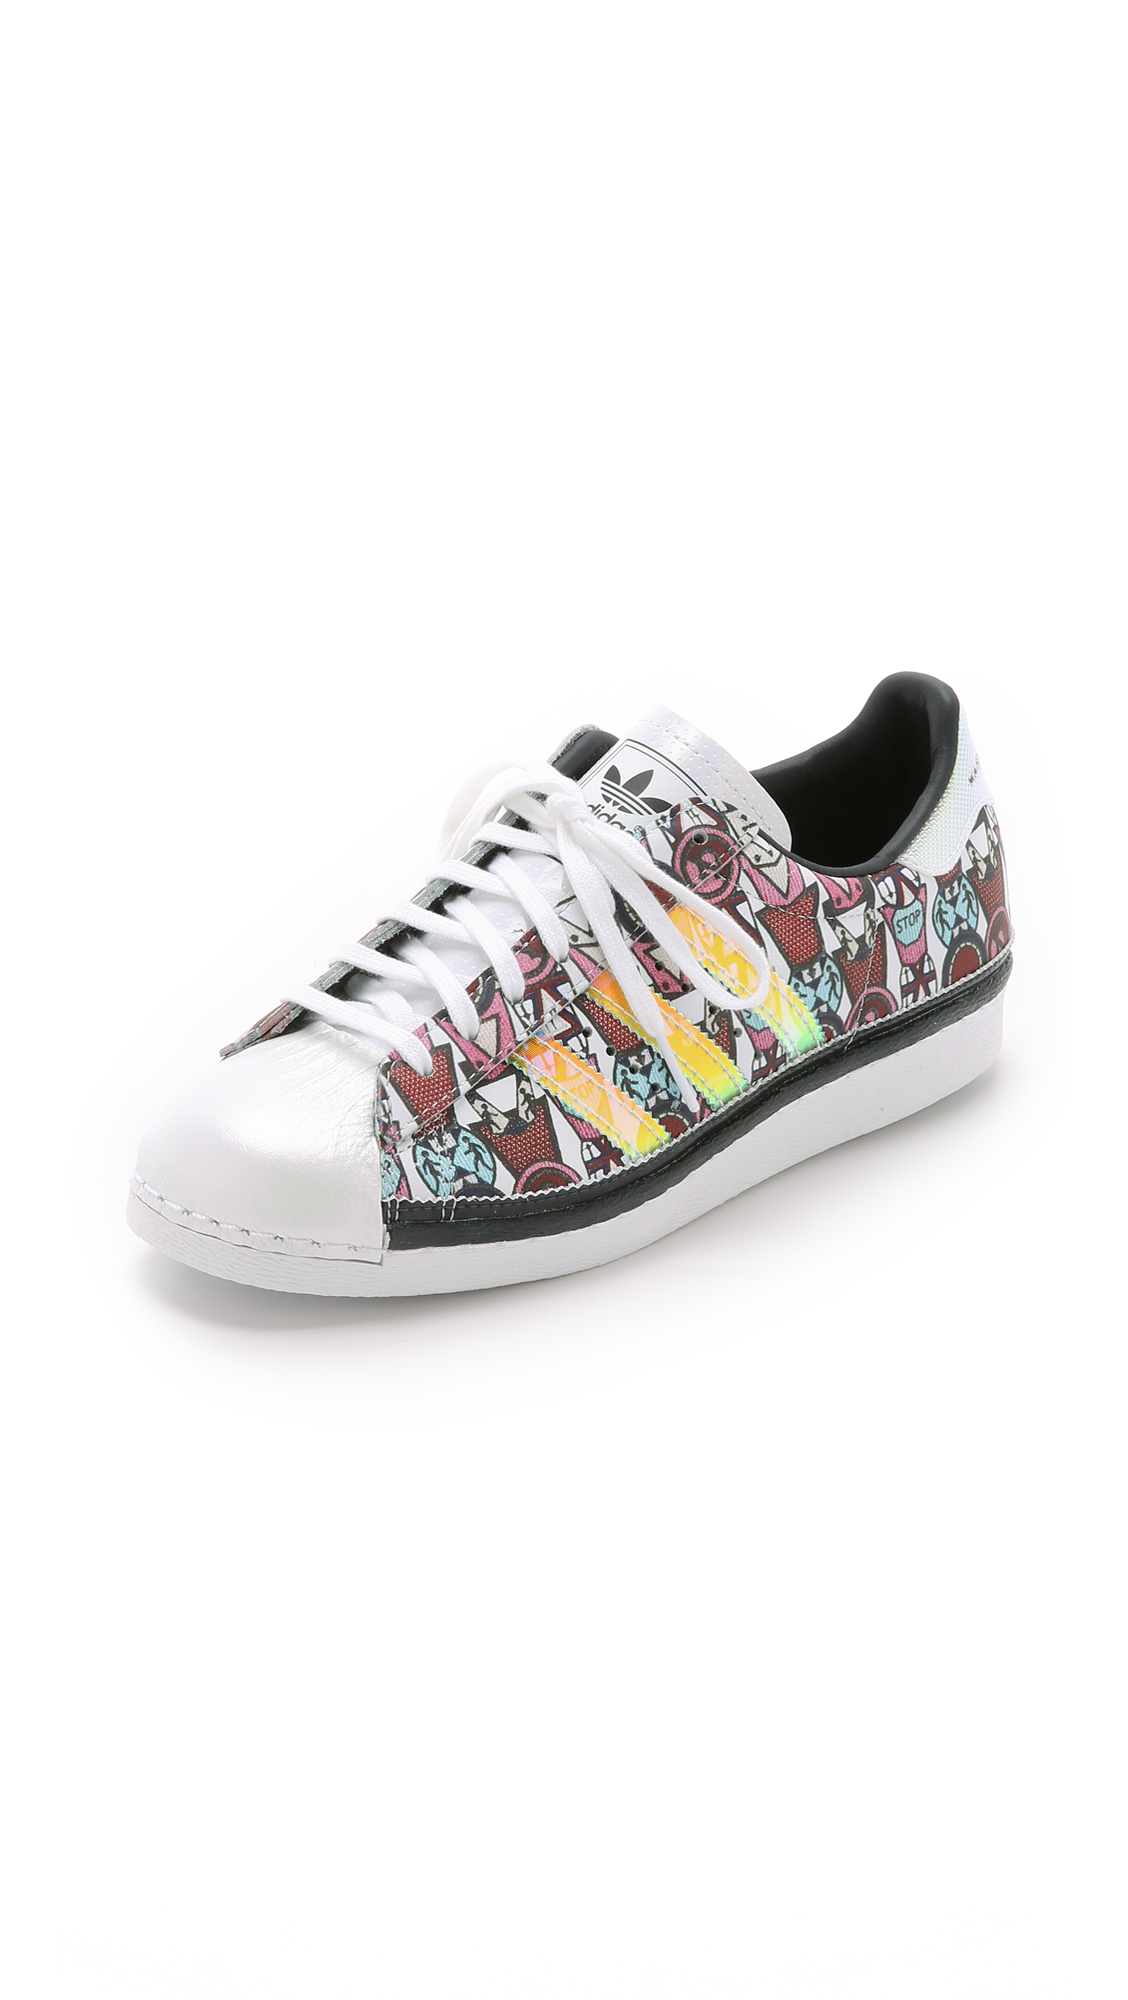 adidas Originals by Mary Katrantzou MK Superstar '80s Badges Sneakers |  SHOPBOP